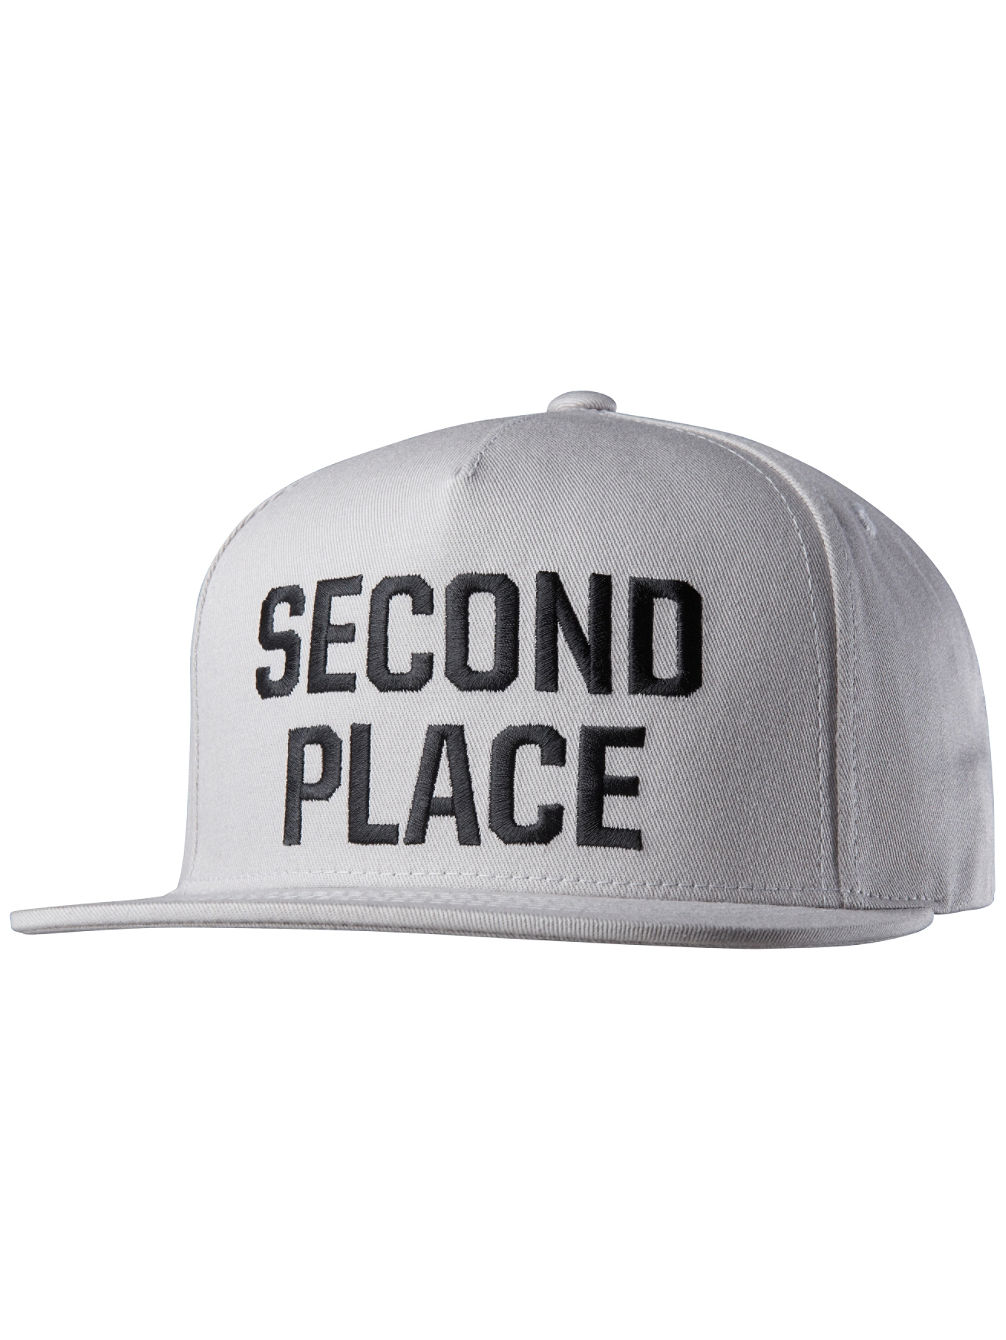 e9c804e134 Second Place Snapback Cap